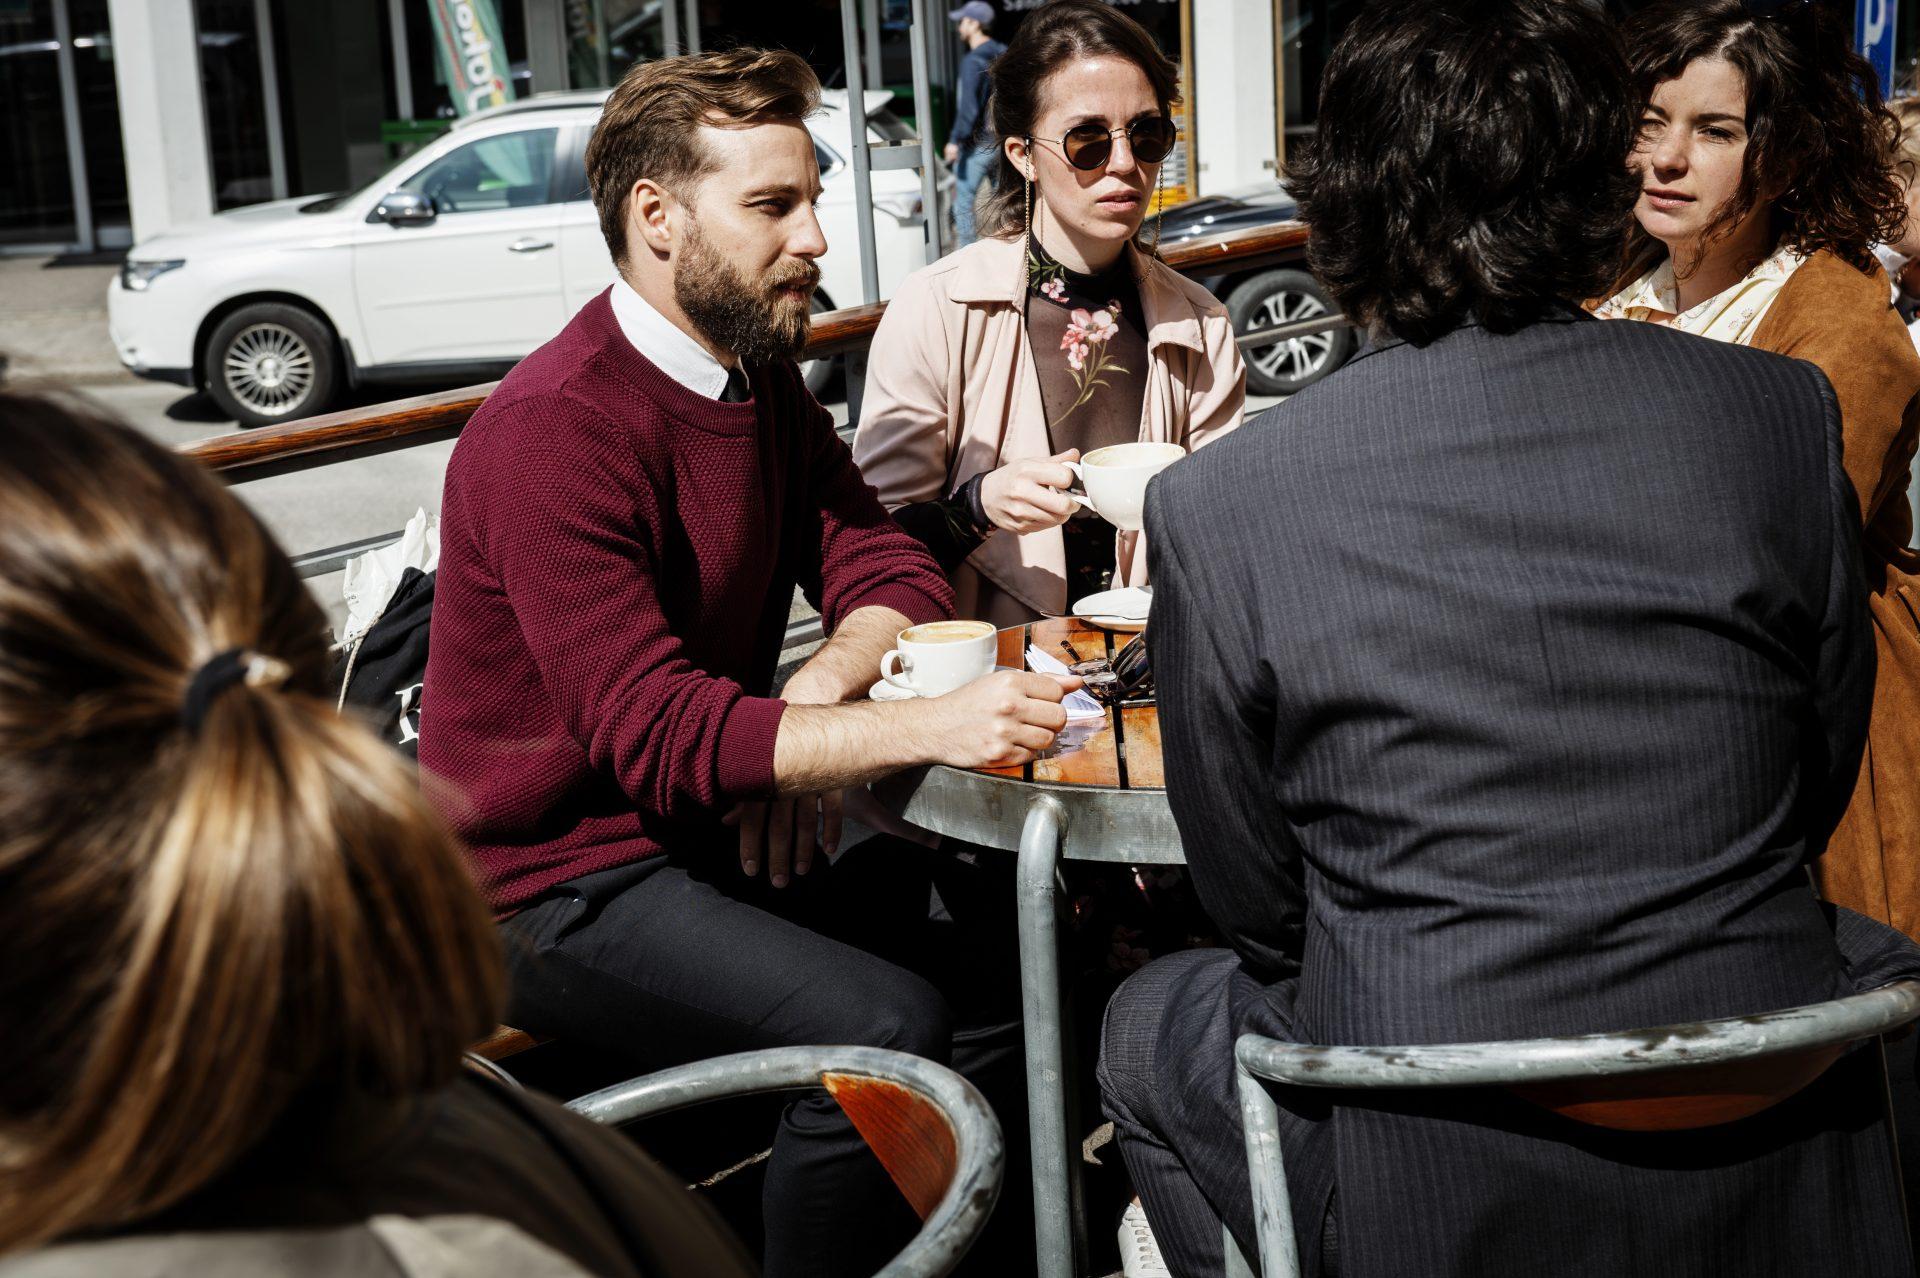 KunsCaféen er kafeen til Sørlandets Kunstmuseum. Deilig kaffe, te, iskrem, varme og kalde retter. Onsdager har både museet og kafeen åpent til klokken 22.